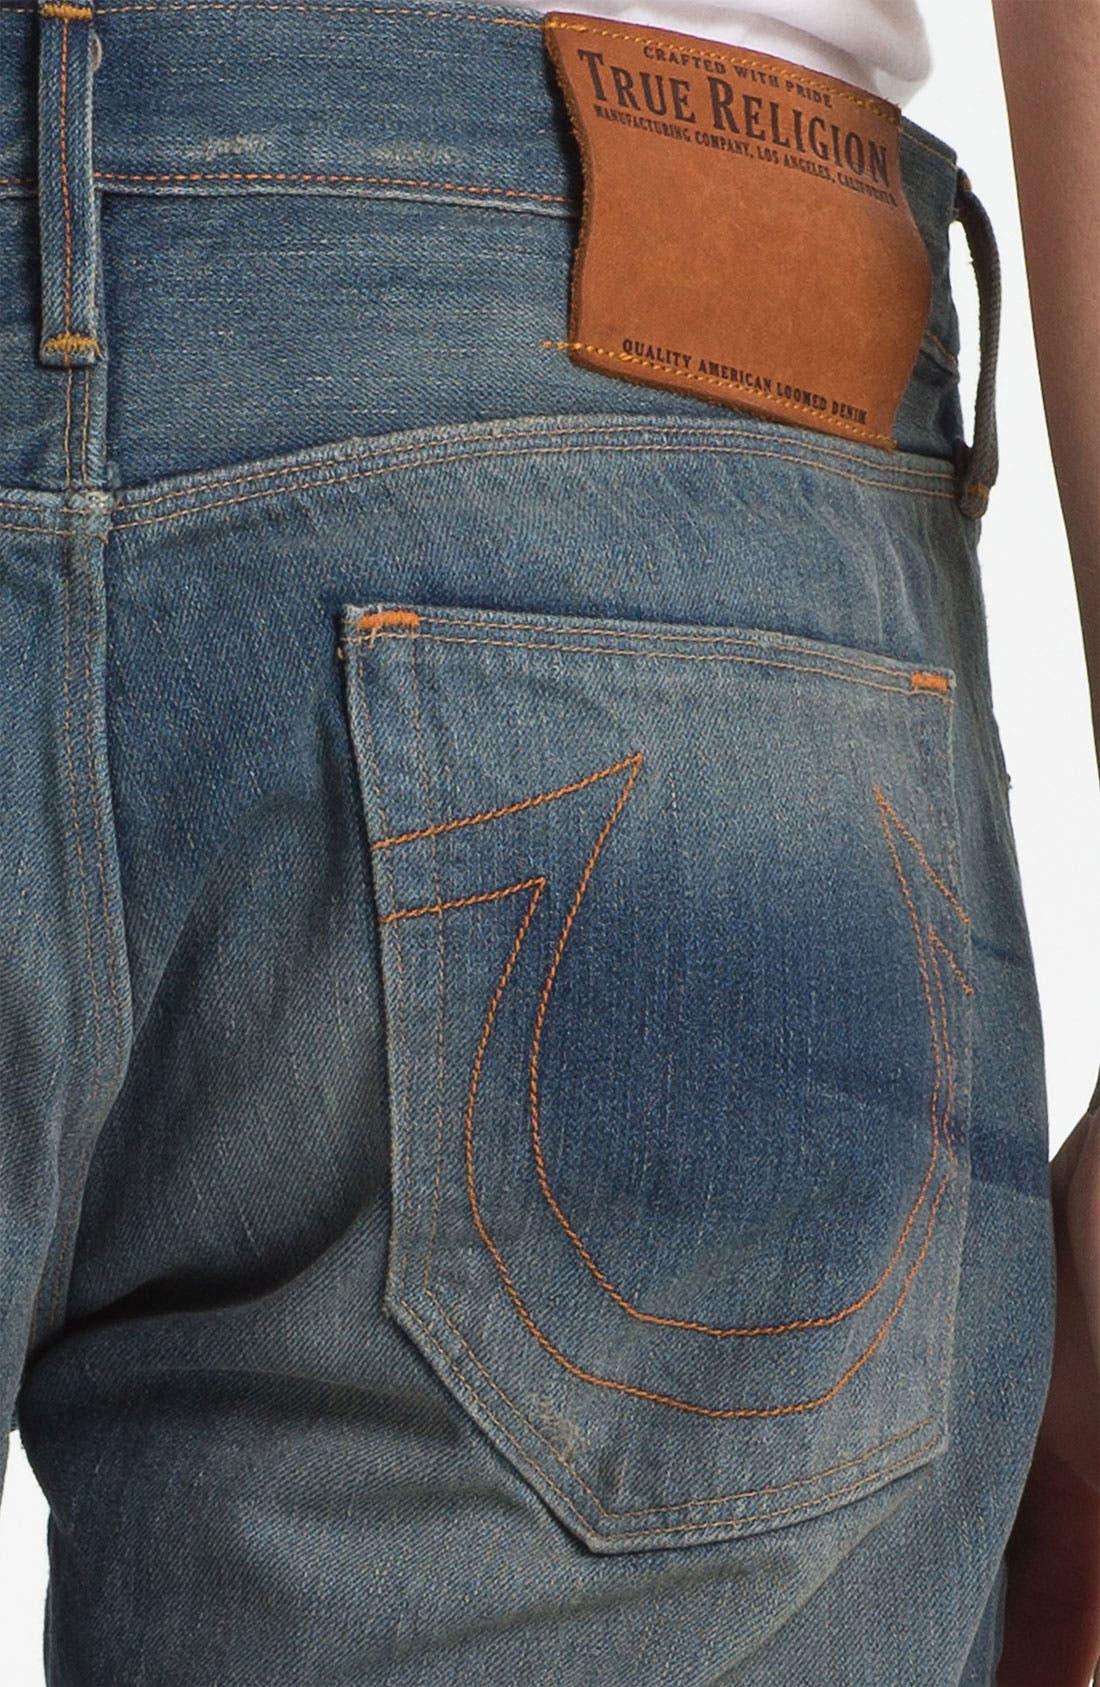 Alternate Image 4  - True Religion Brand Jeans 'Geno 50s' Slim Straight Leg Jeans (Deadwood)